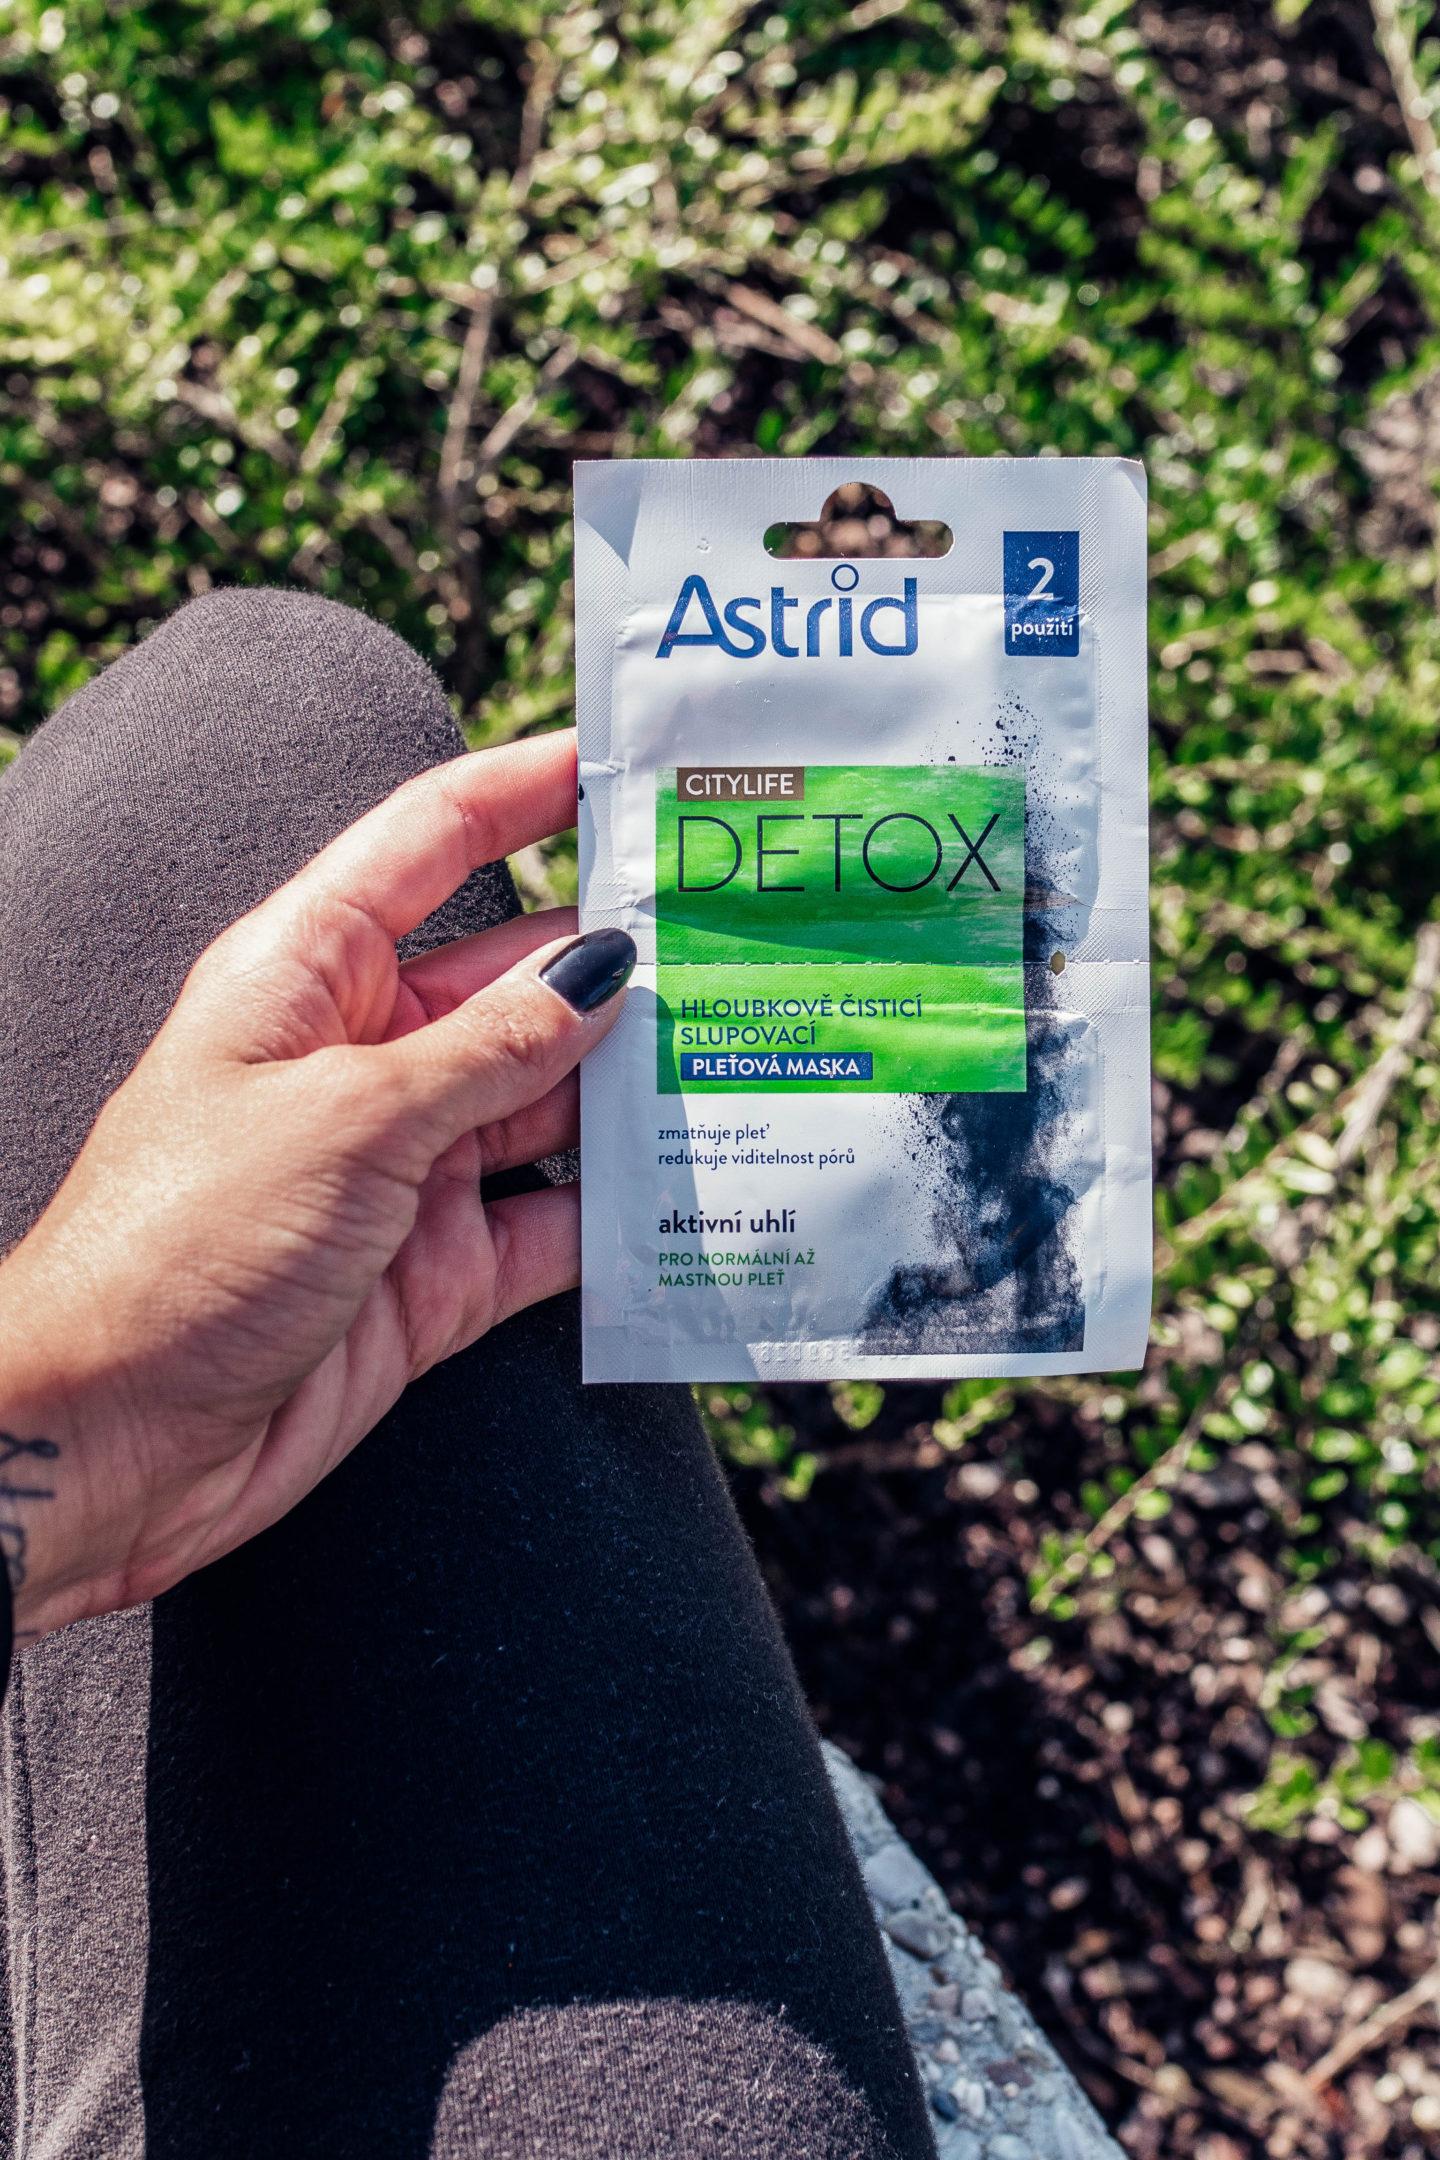 astrid detox city řada recenze kosmetika krém micelární voda brunettie